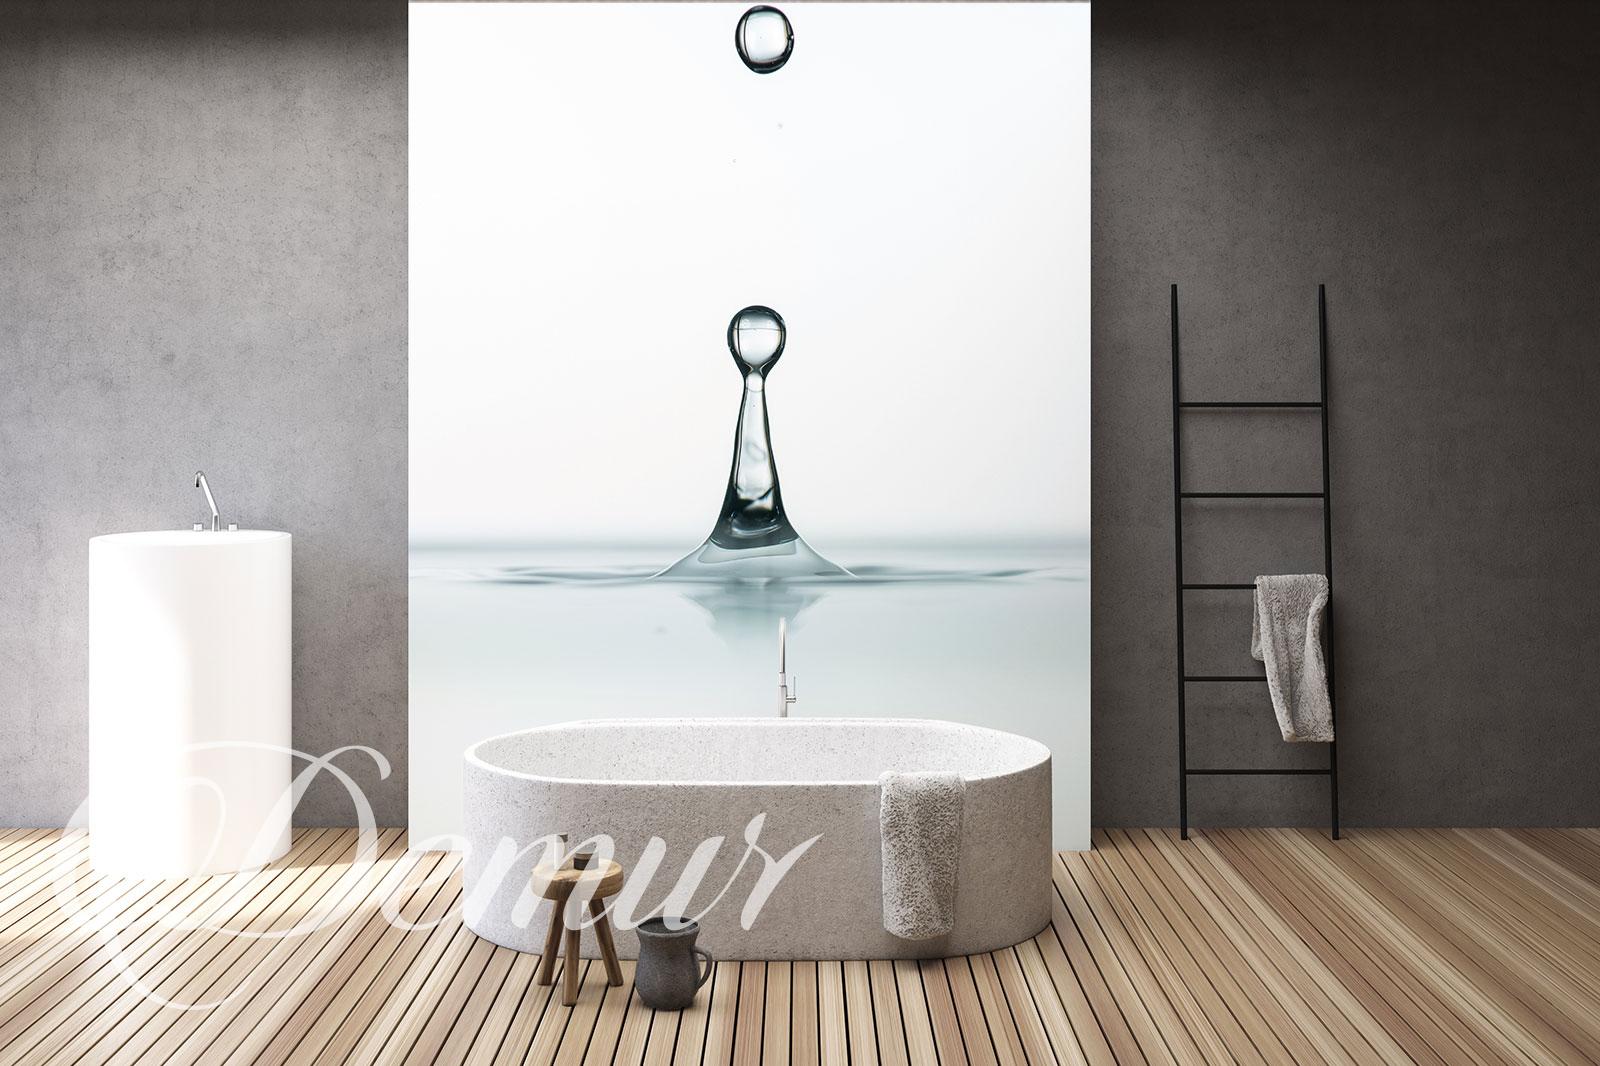 łazienka Bez Płytek Inspiracje Demur